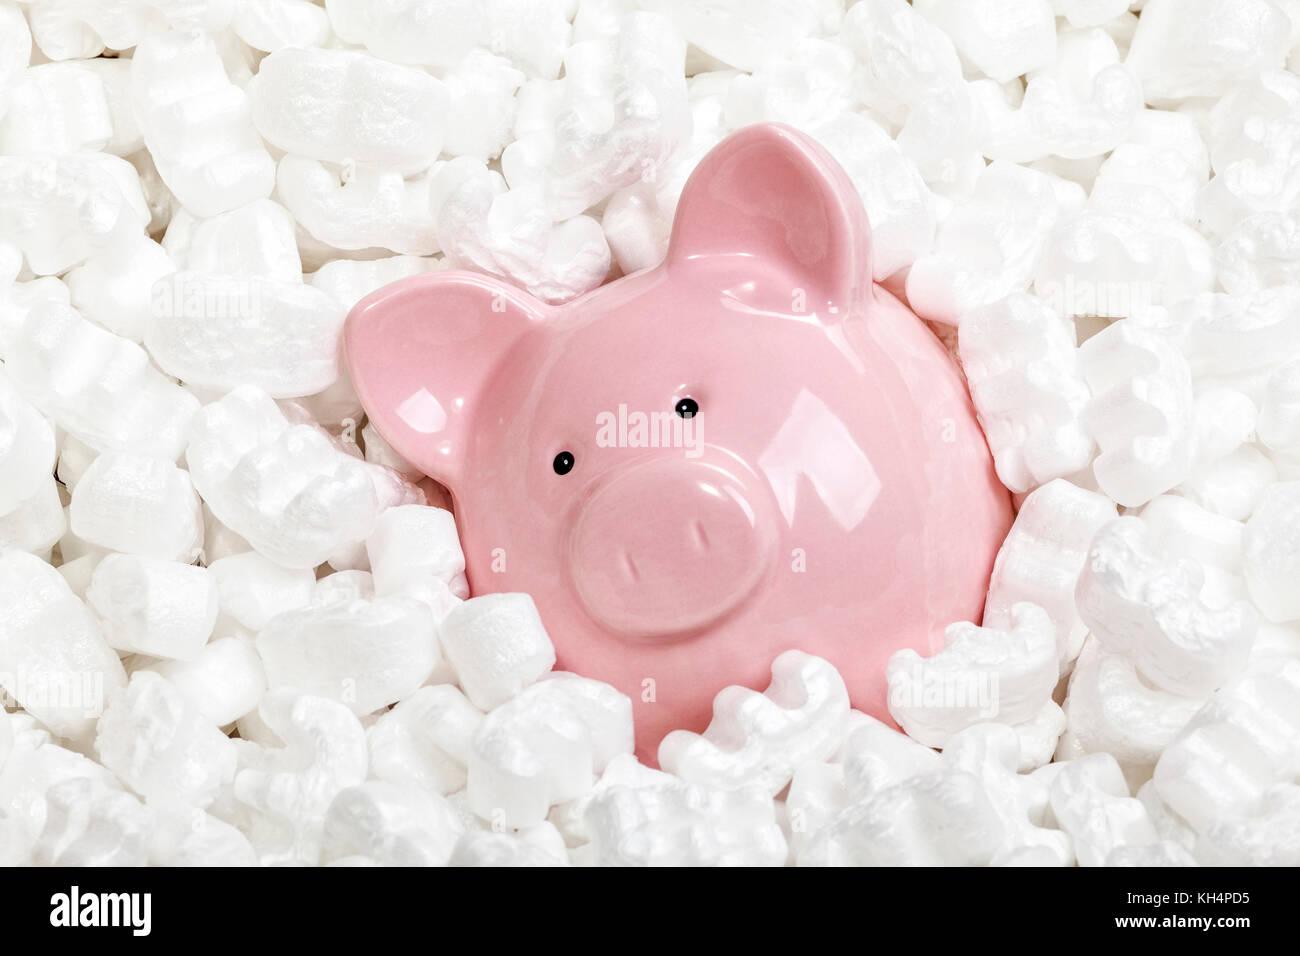 piggybank and polystyrene peanuts background - Stock Image